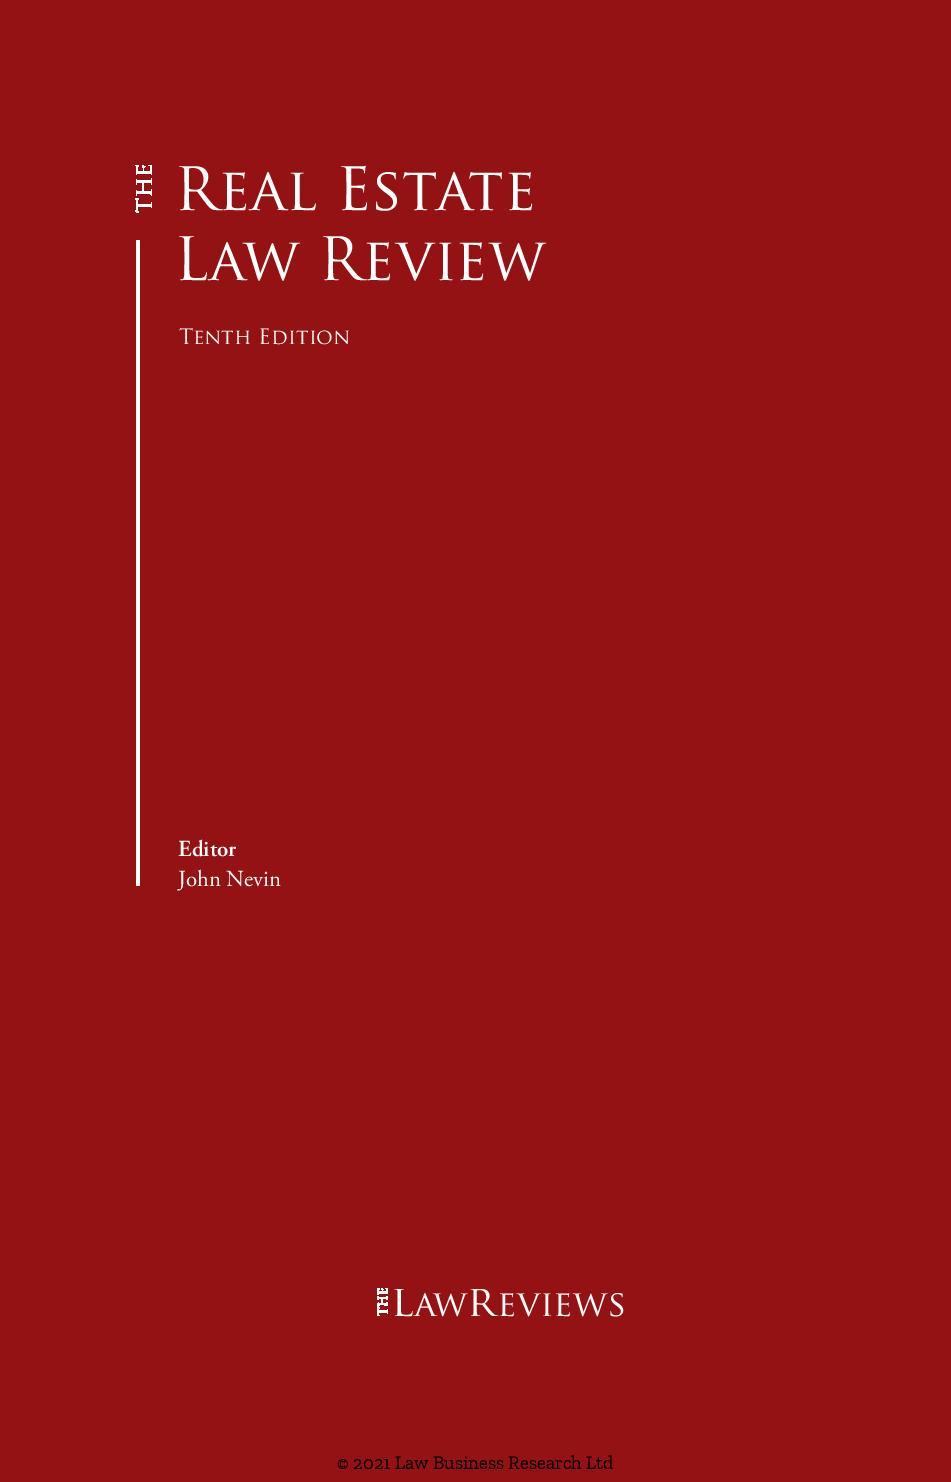 Patrikios Pavlou & Associates LLC: The Real Estate Law Review